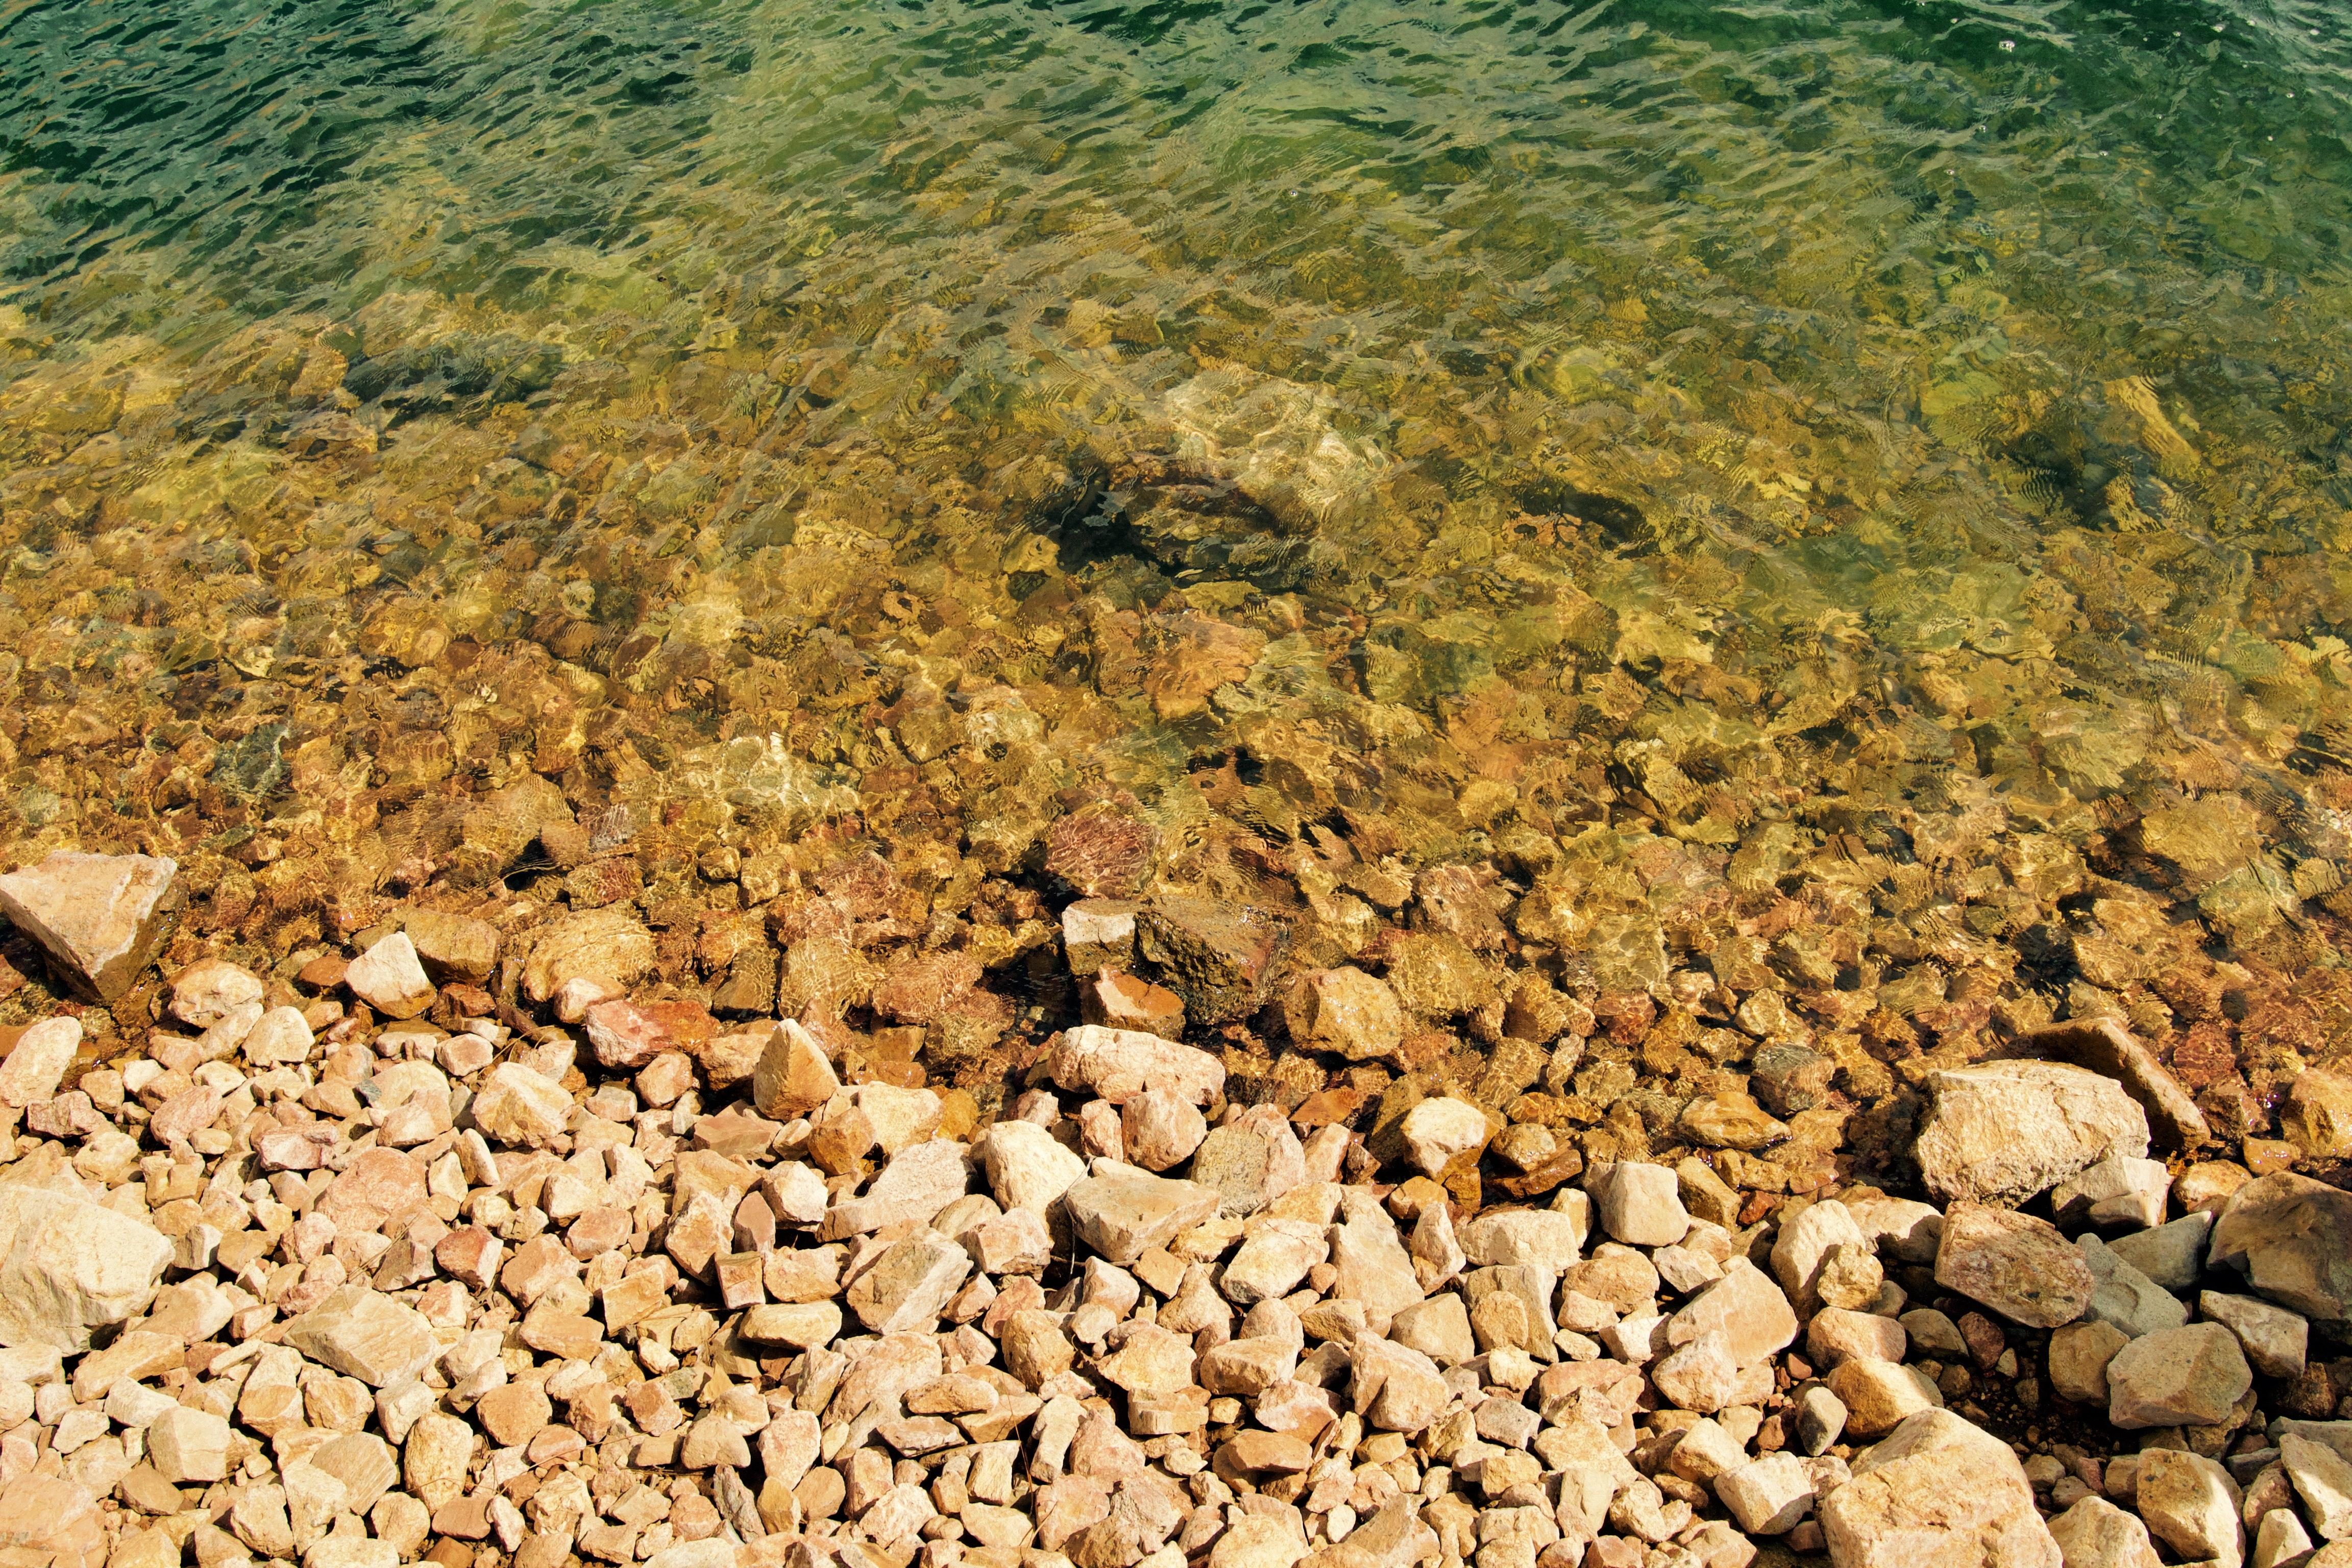 Free Images : environment, gravel, landscape, outdoors, pebbles